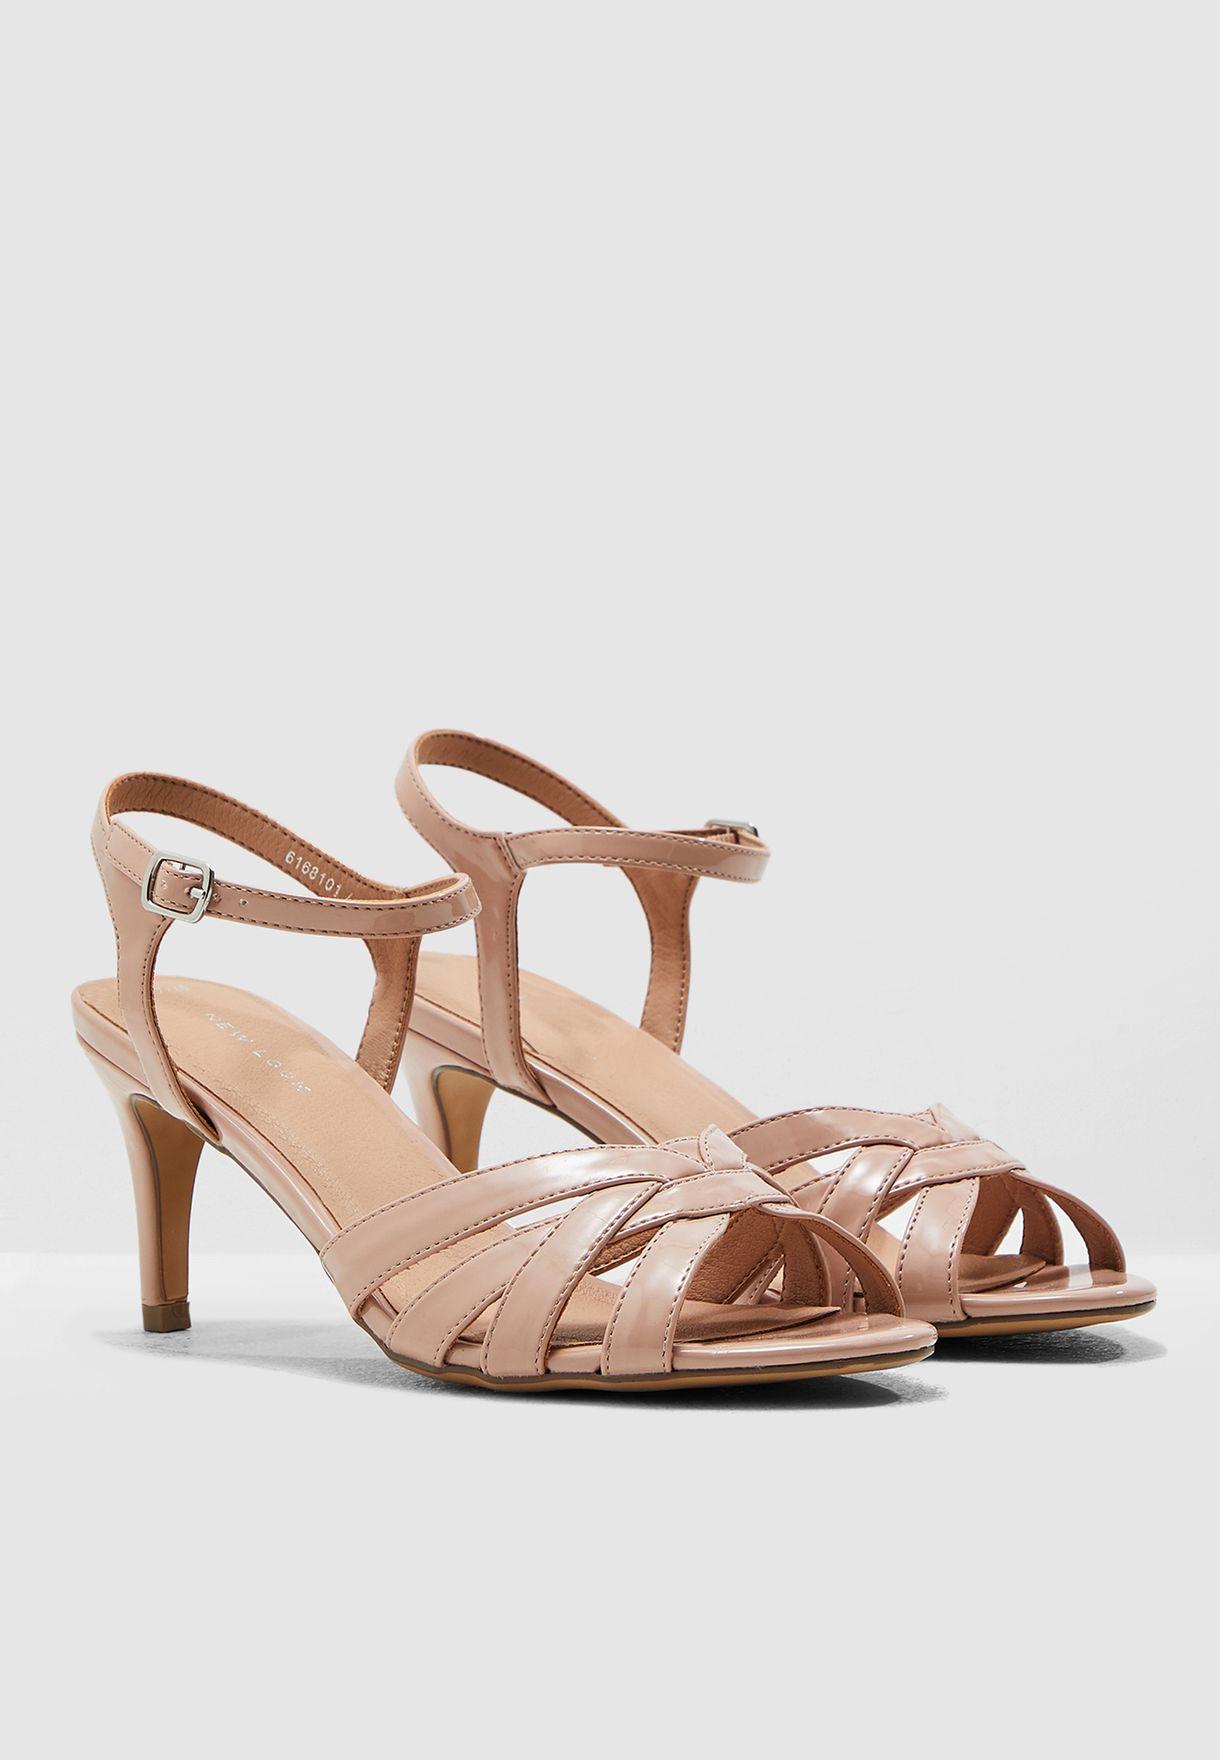 Shopper Ankle Strap Sandal - Beige